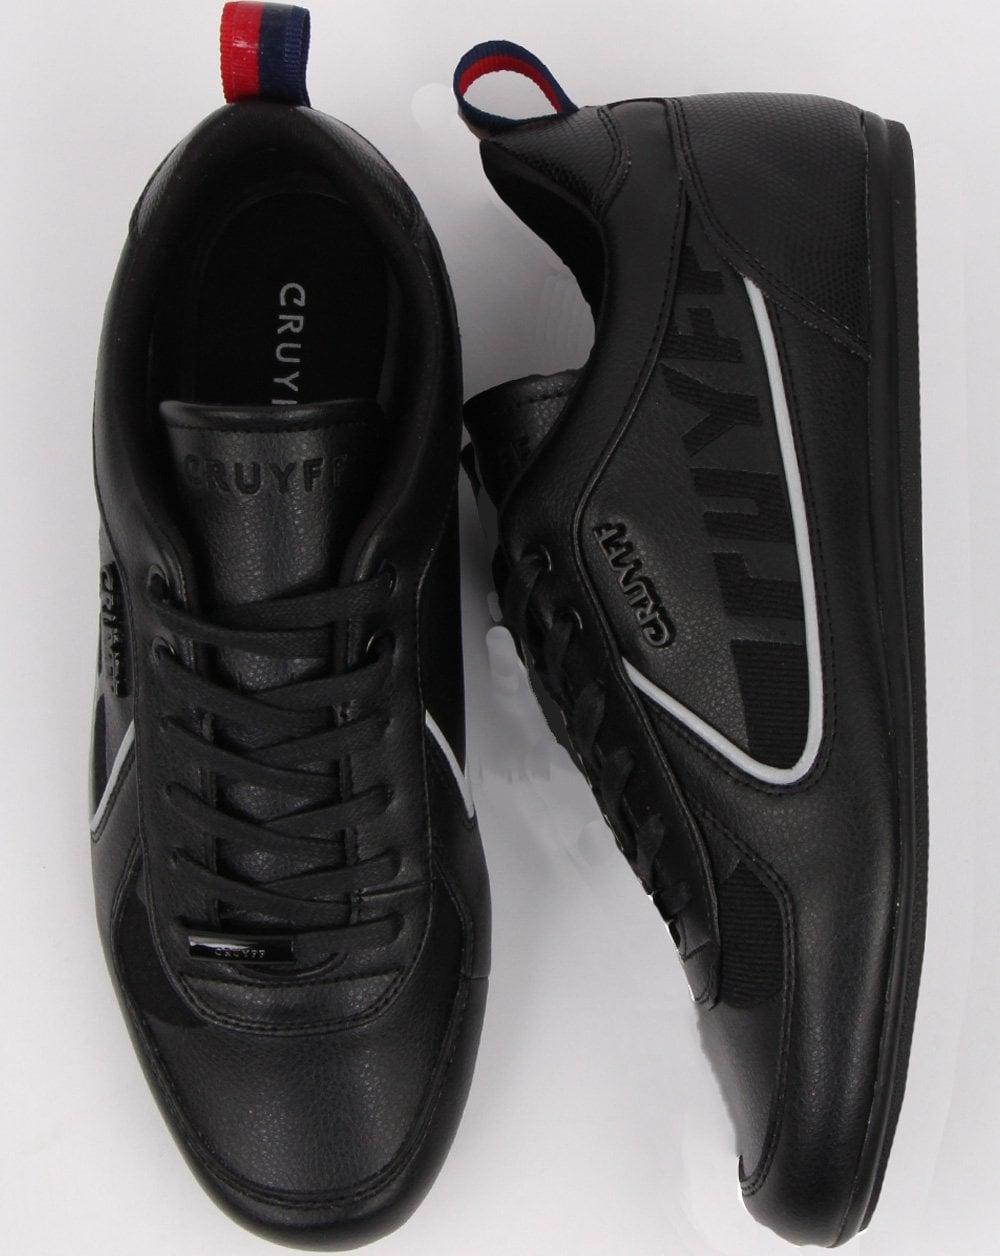 Cruyff Classics Cruyff Nite Crawler V2 Black Trainers CC7780193590